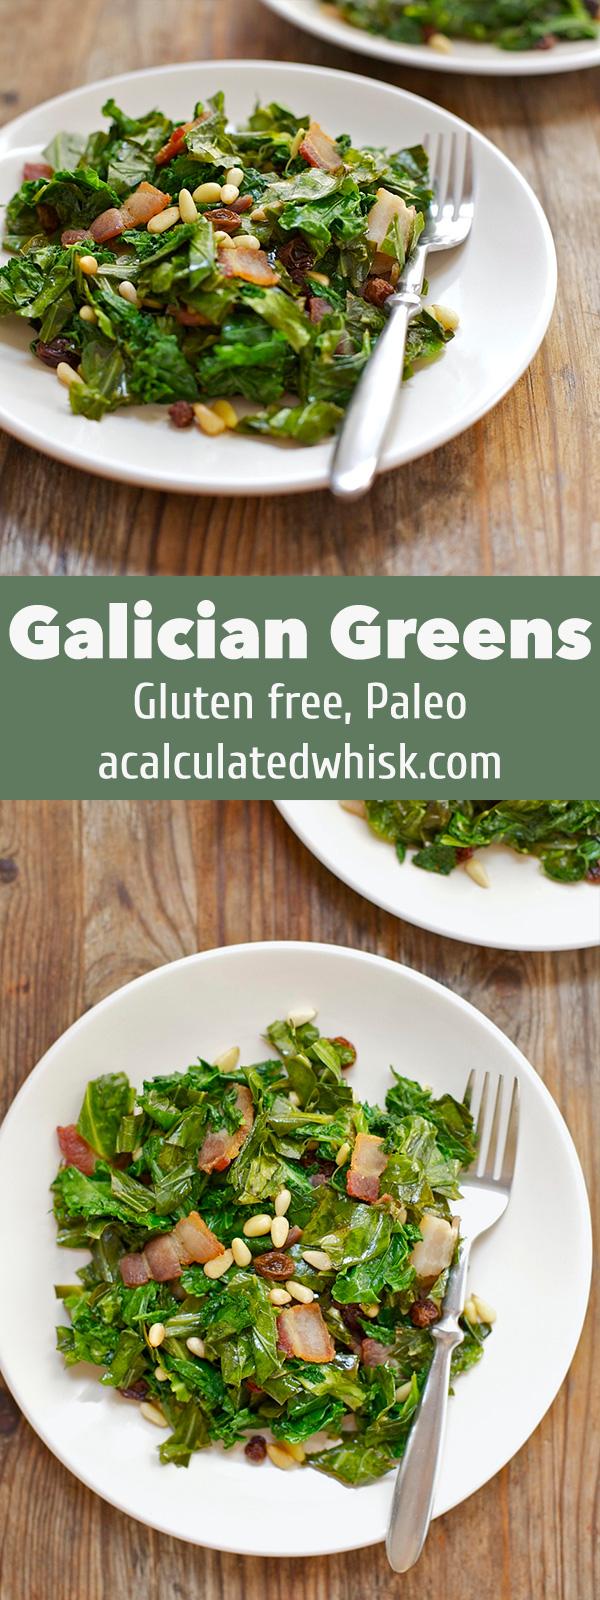 Galician Greens | acalculatedwhisk.com